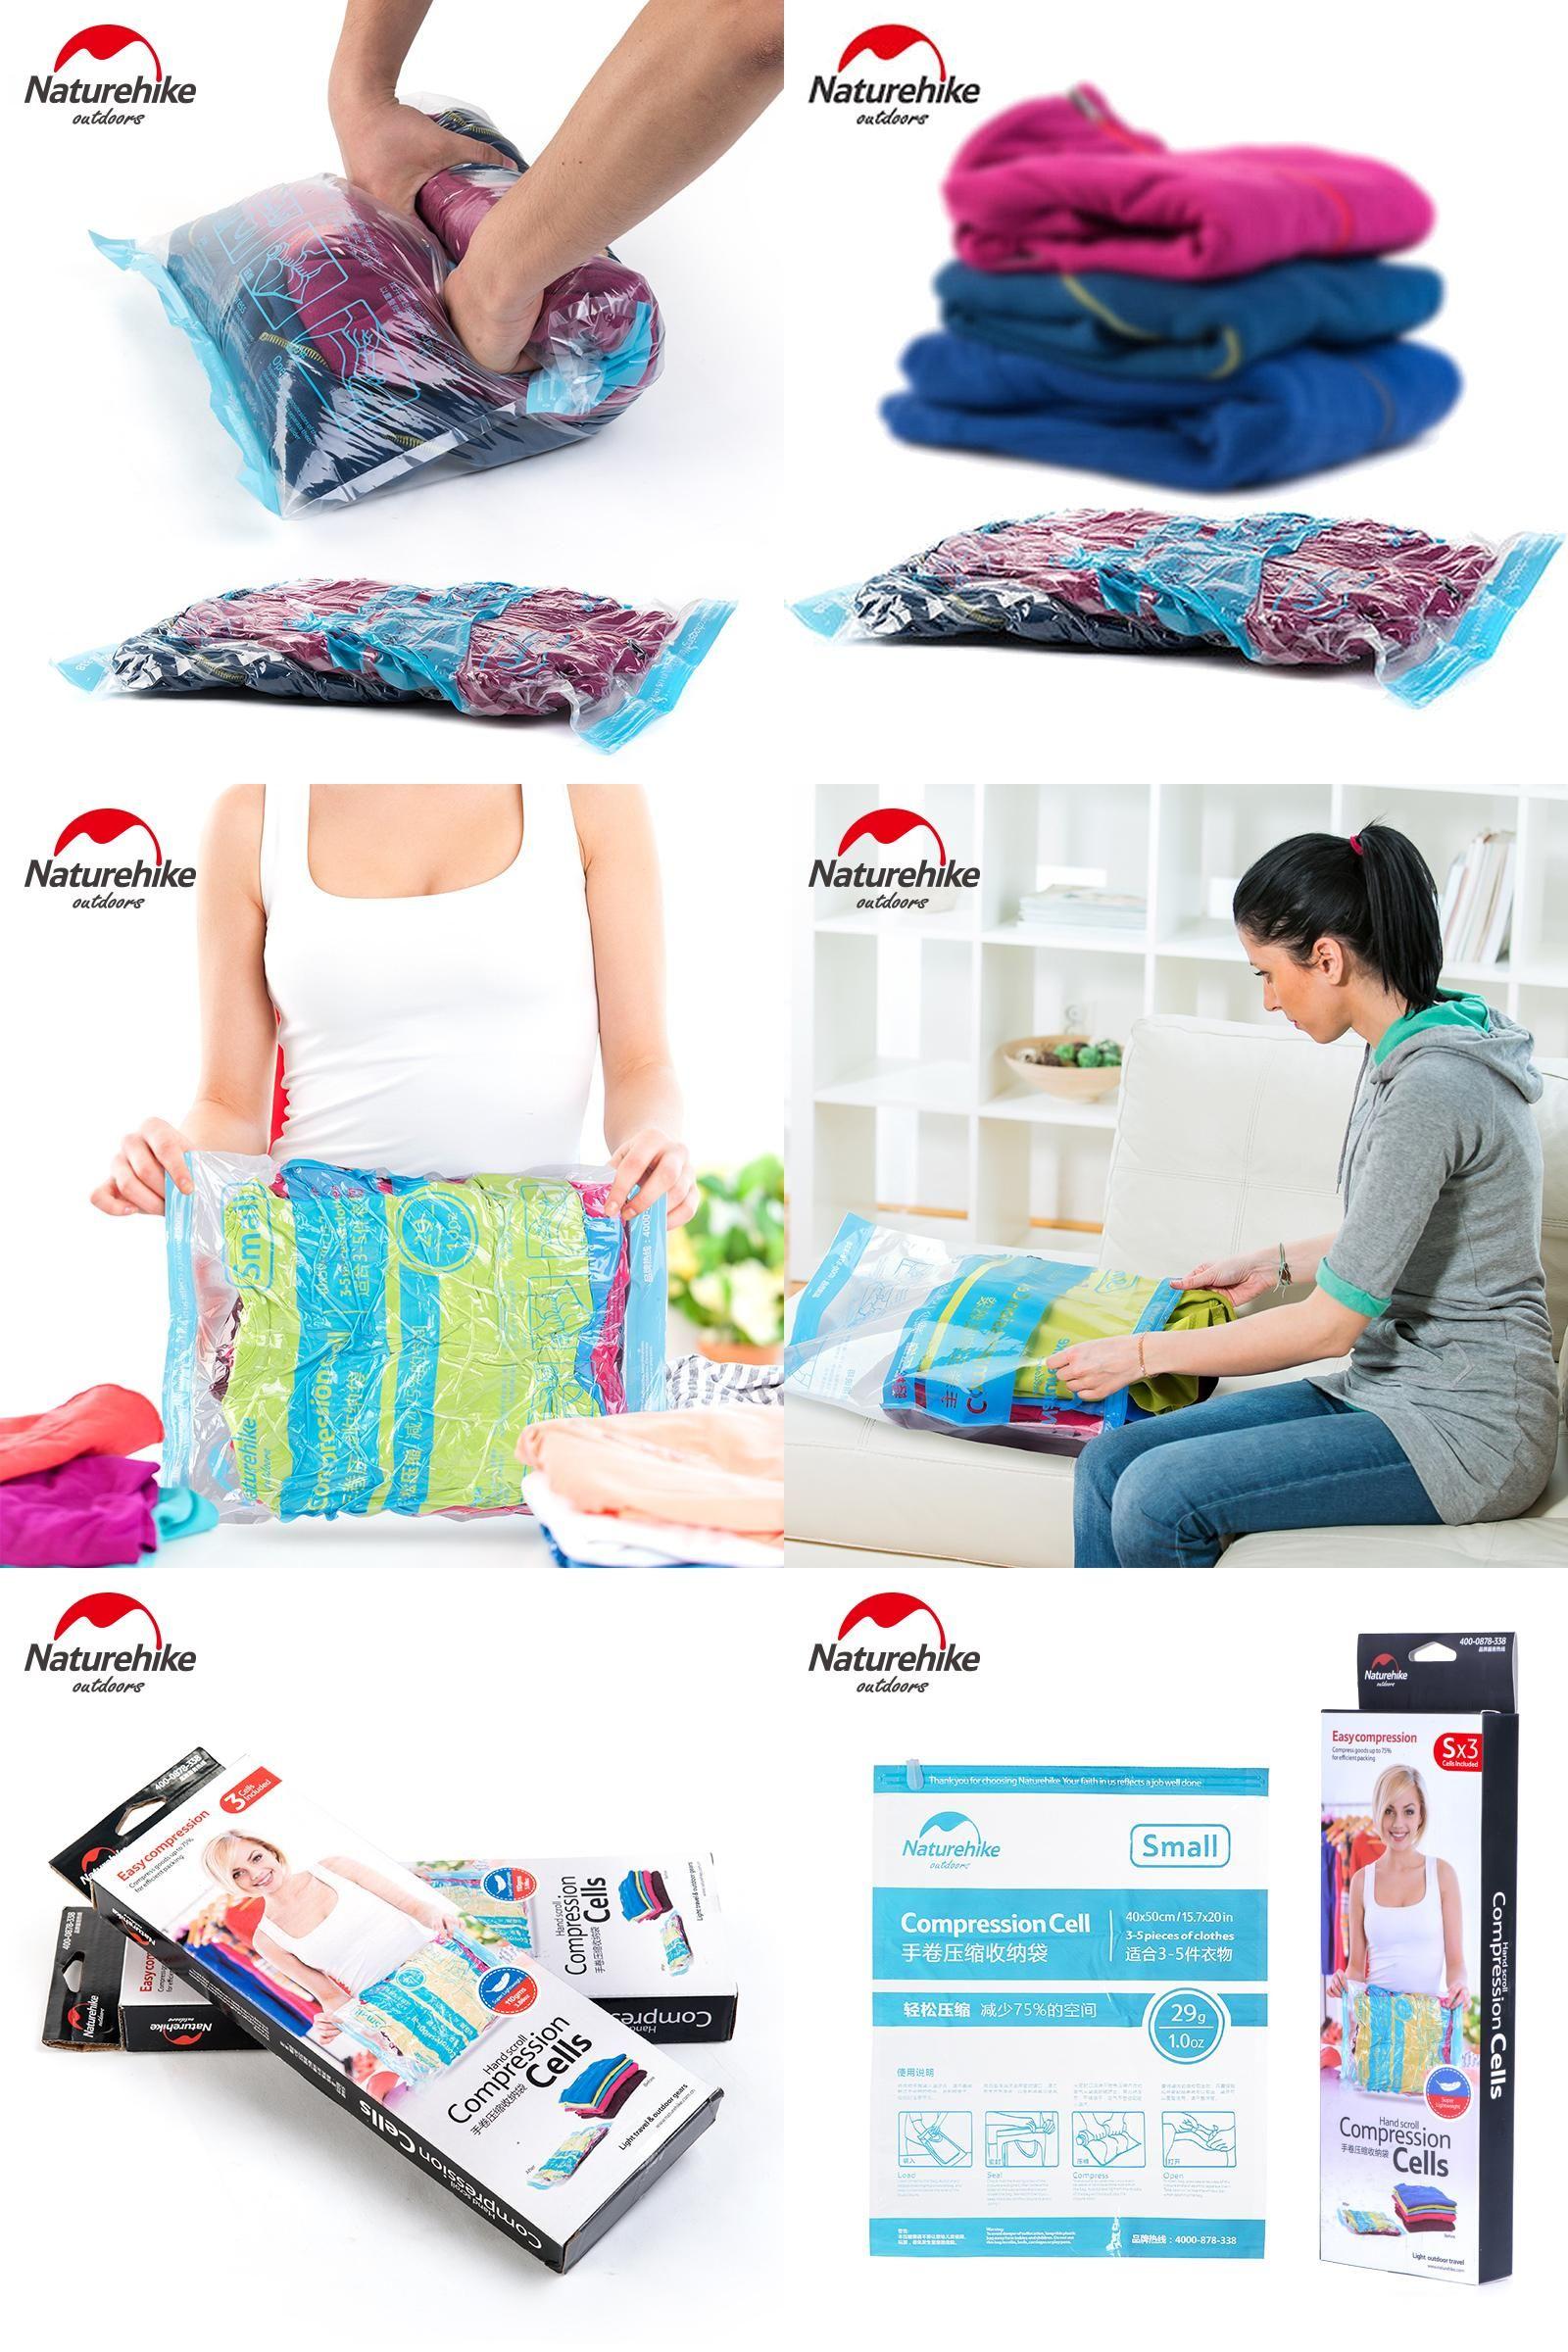 bcba05dd0464 Visit to Buy] NatureHike Vacuum Swim Clothes Storage Bags Hand ...